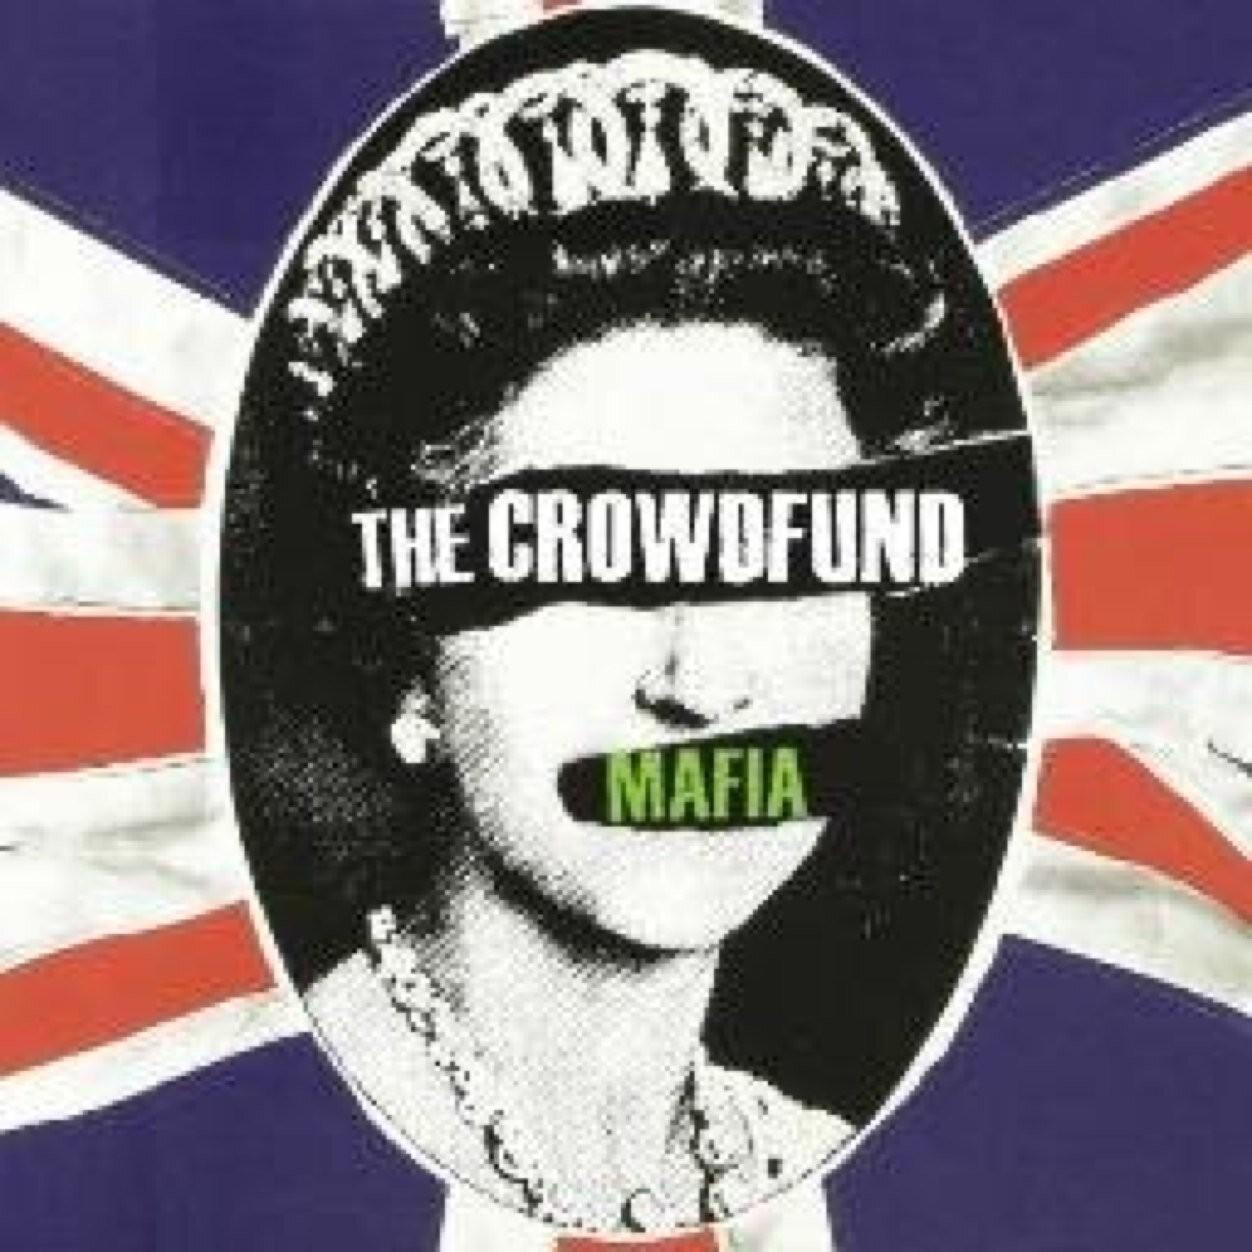 The Crowdfund Mafia